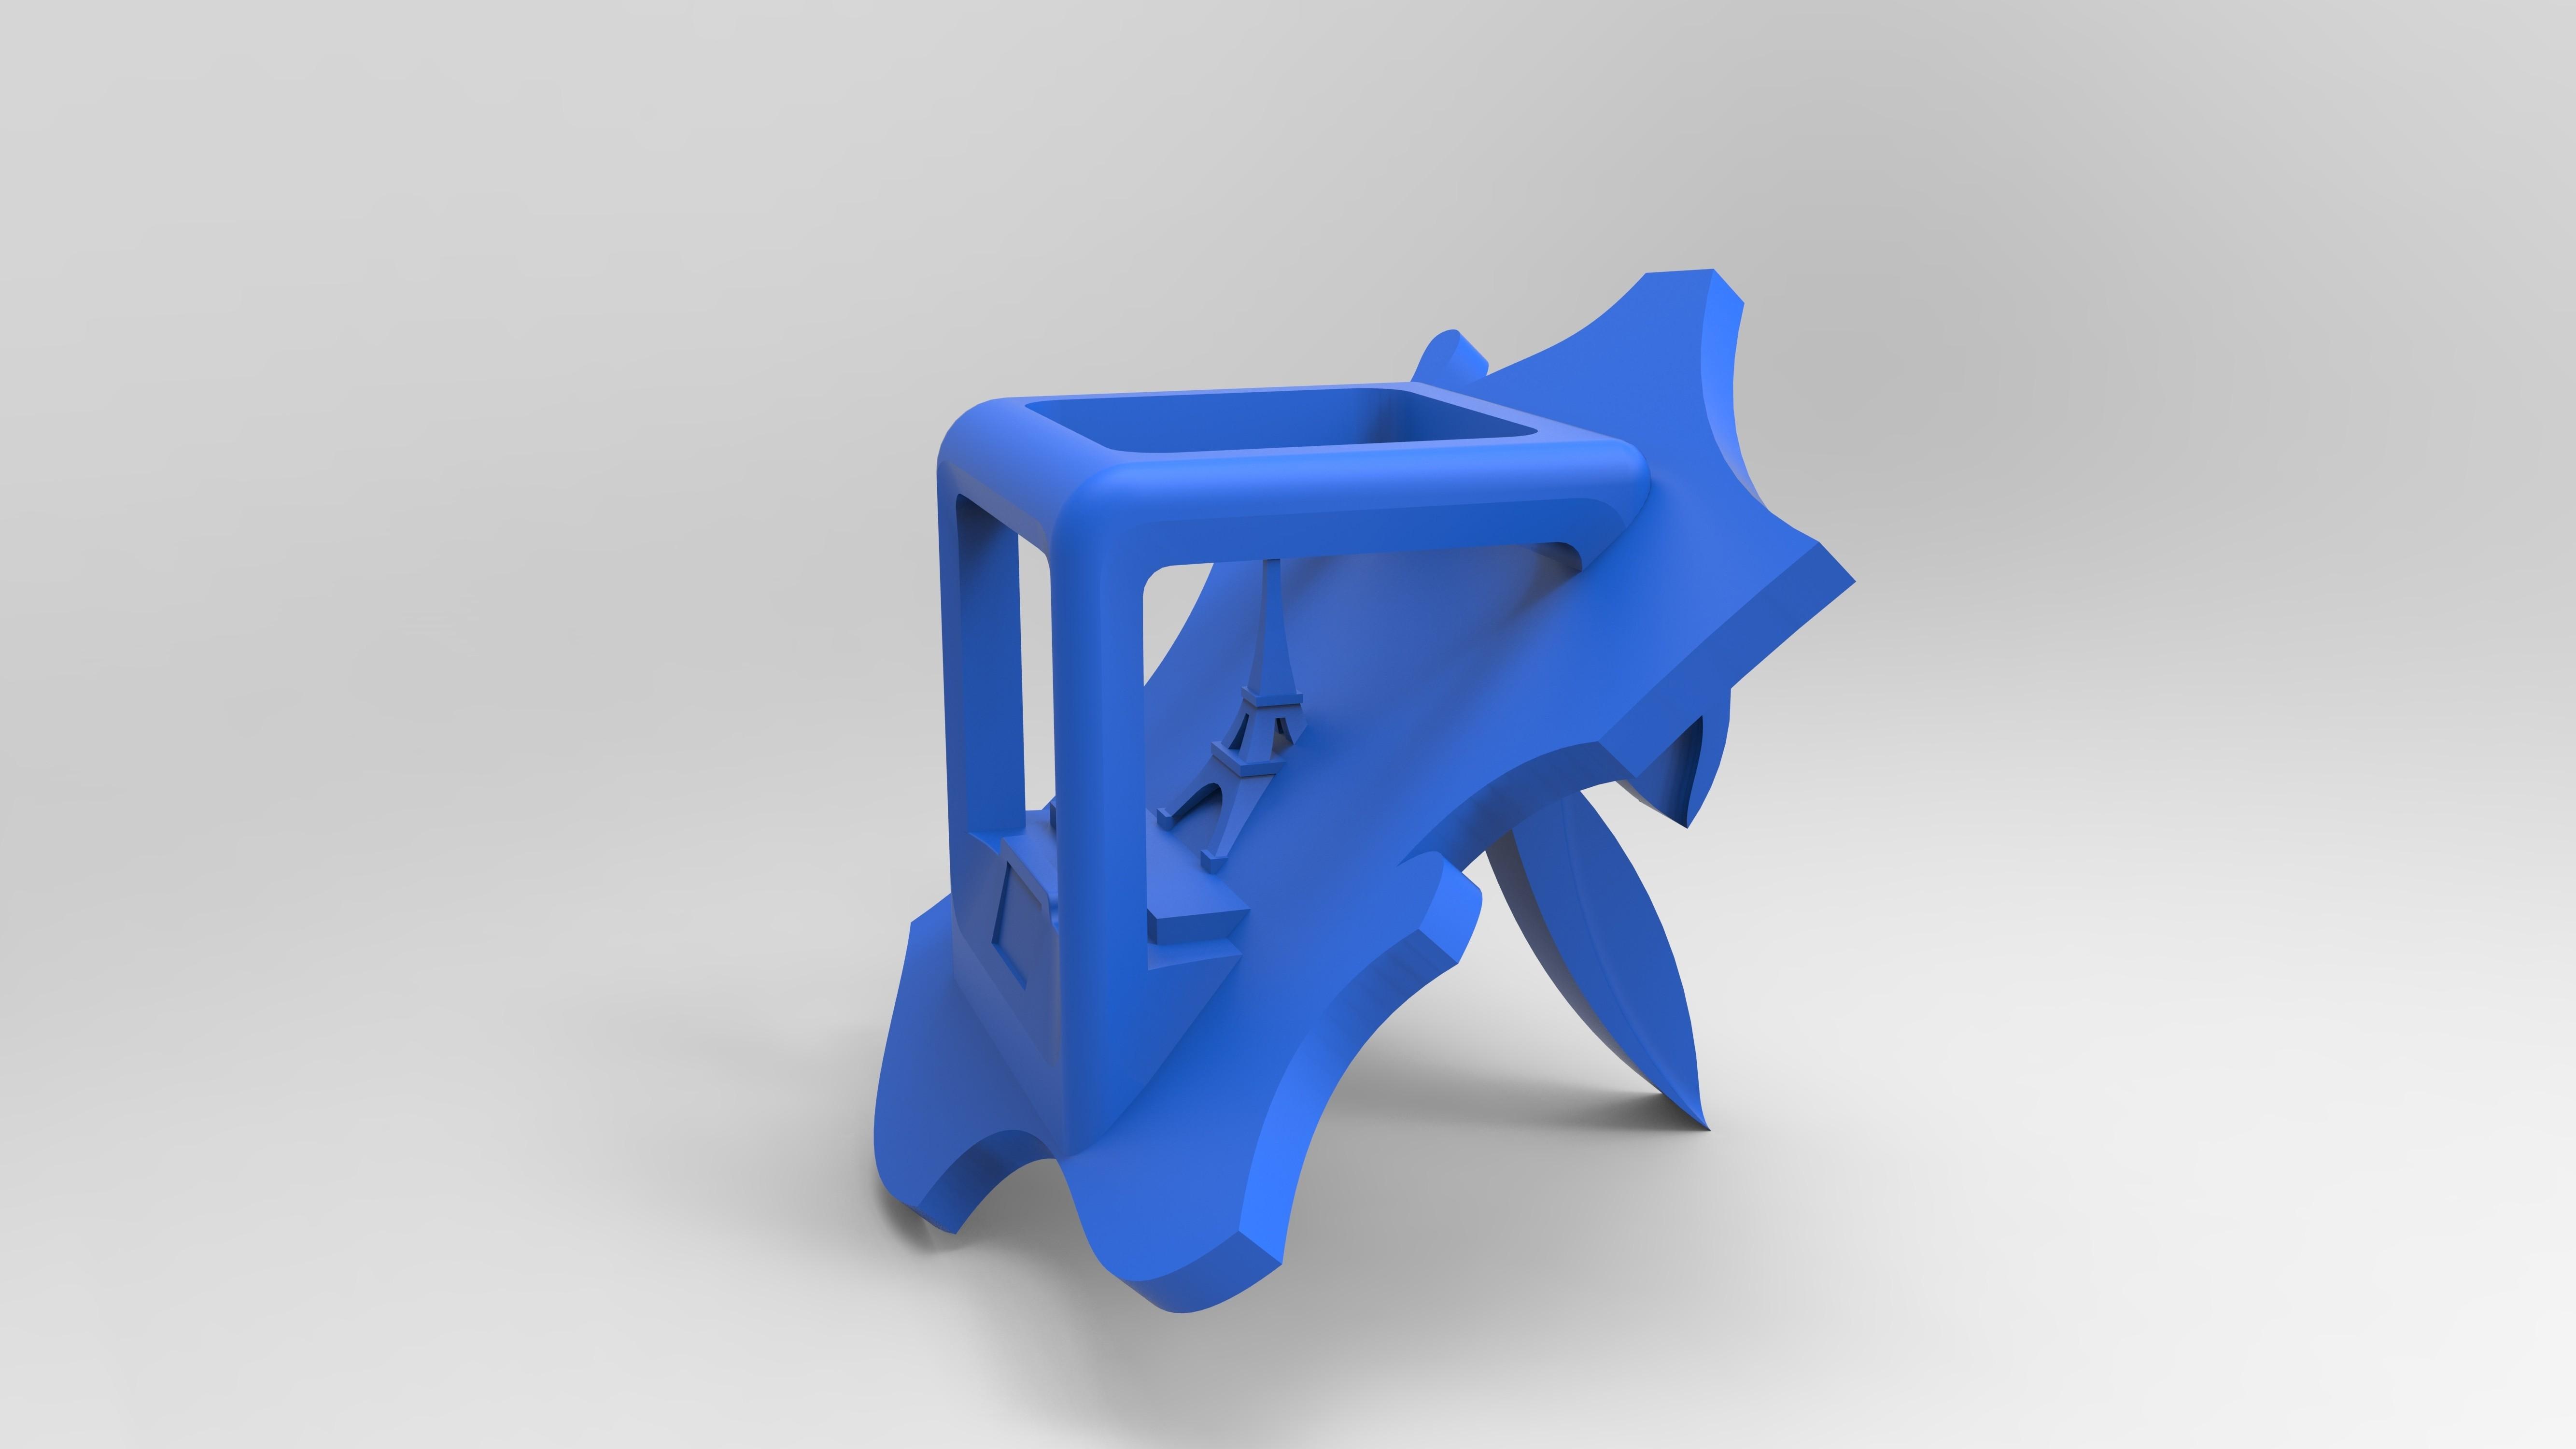 renducie droitvebleu.198.jpg Download free STL file Key ring or stratomaker figurine - printer located in France • 3D printer template, GuilhemPerroud